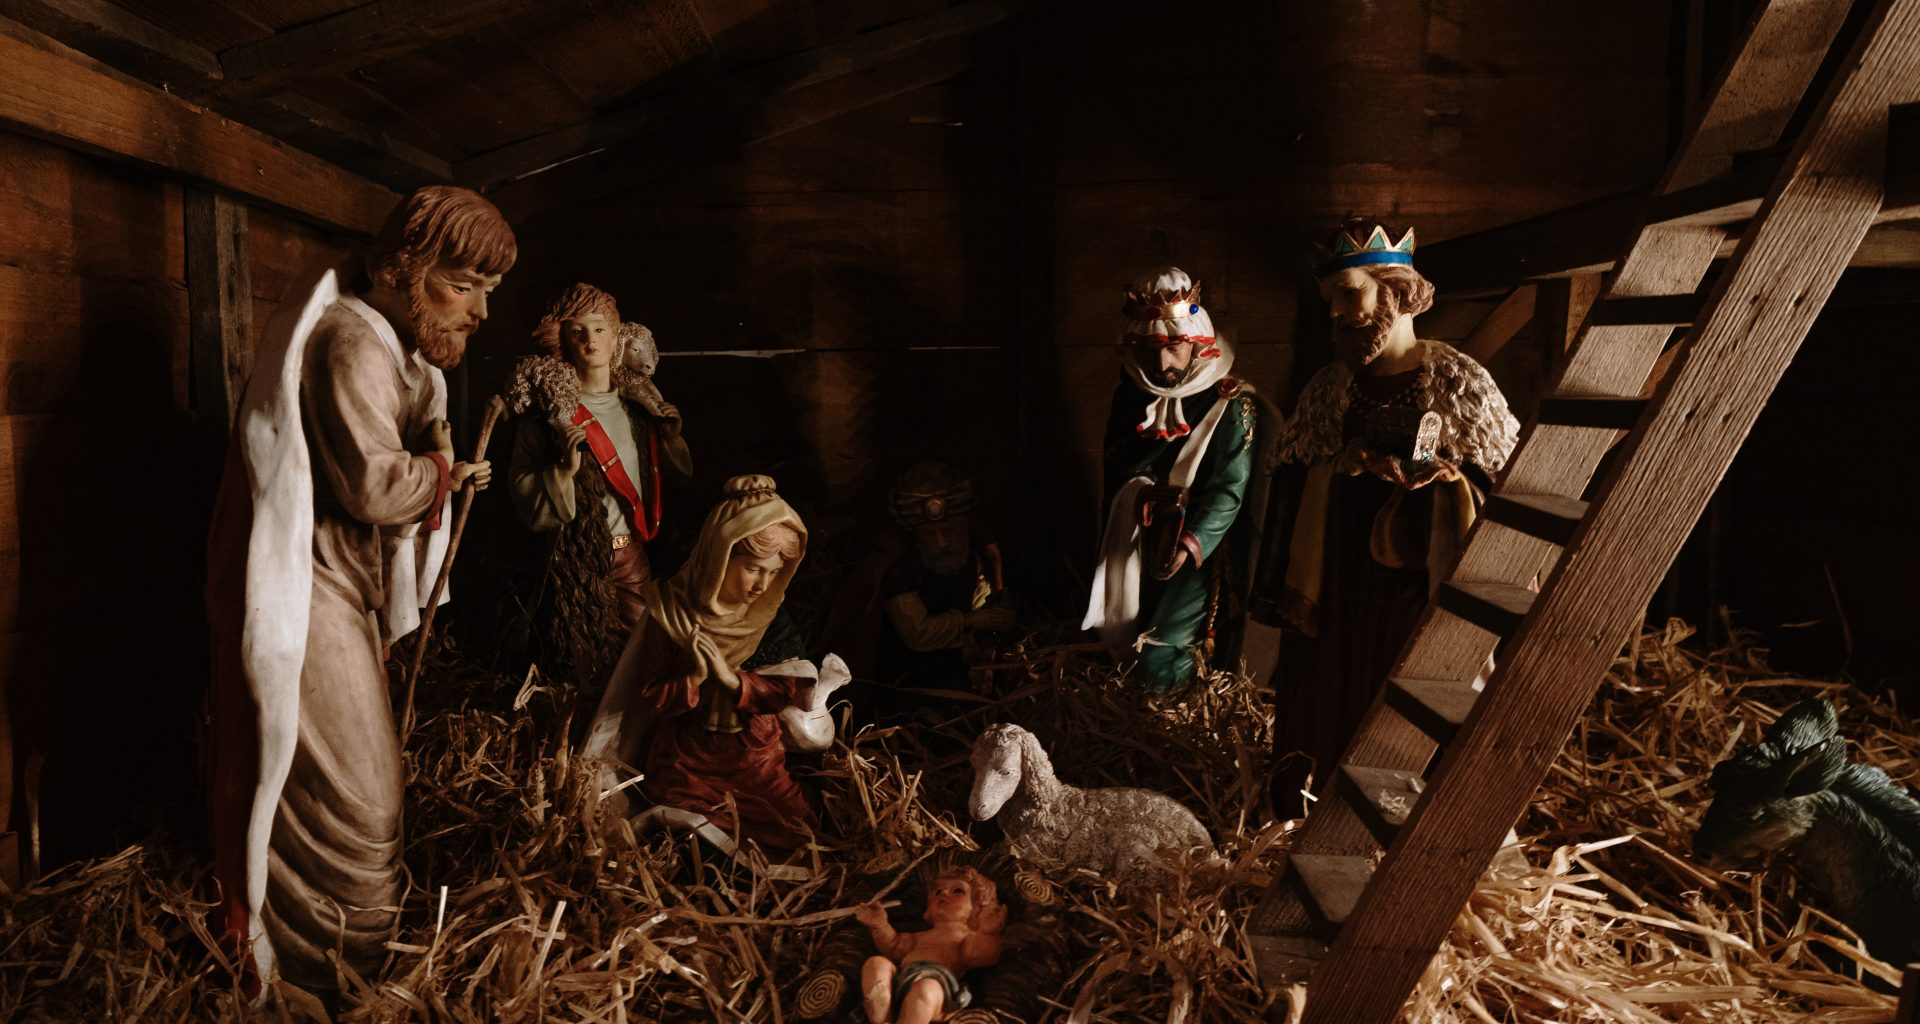 The Nativity figurines